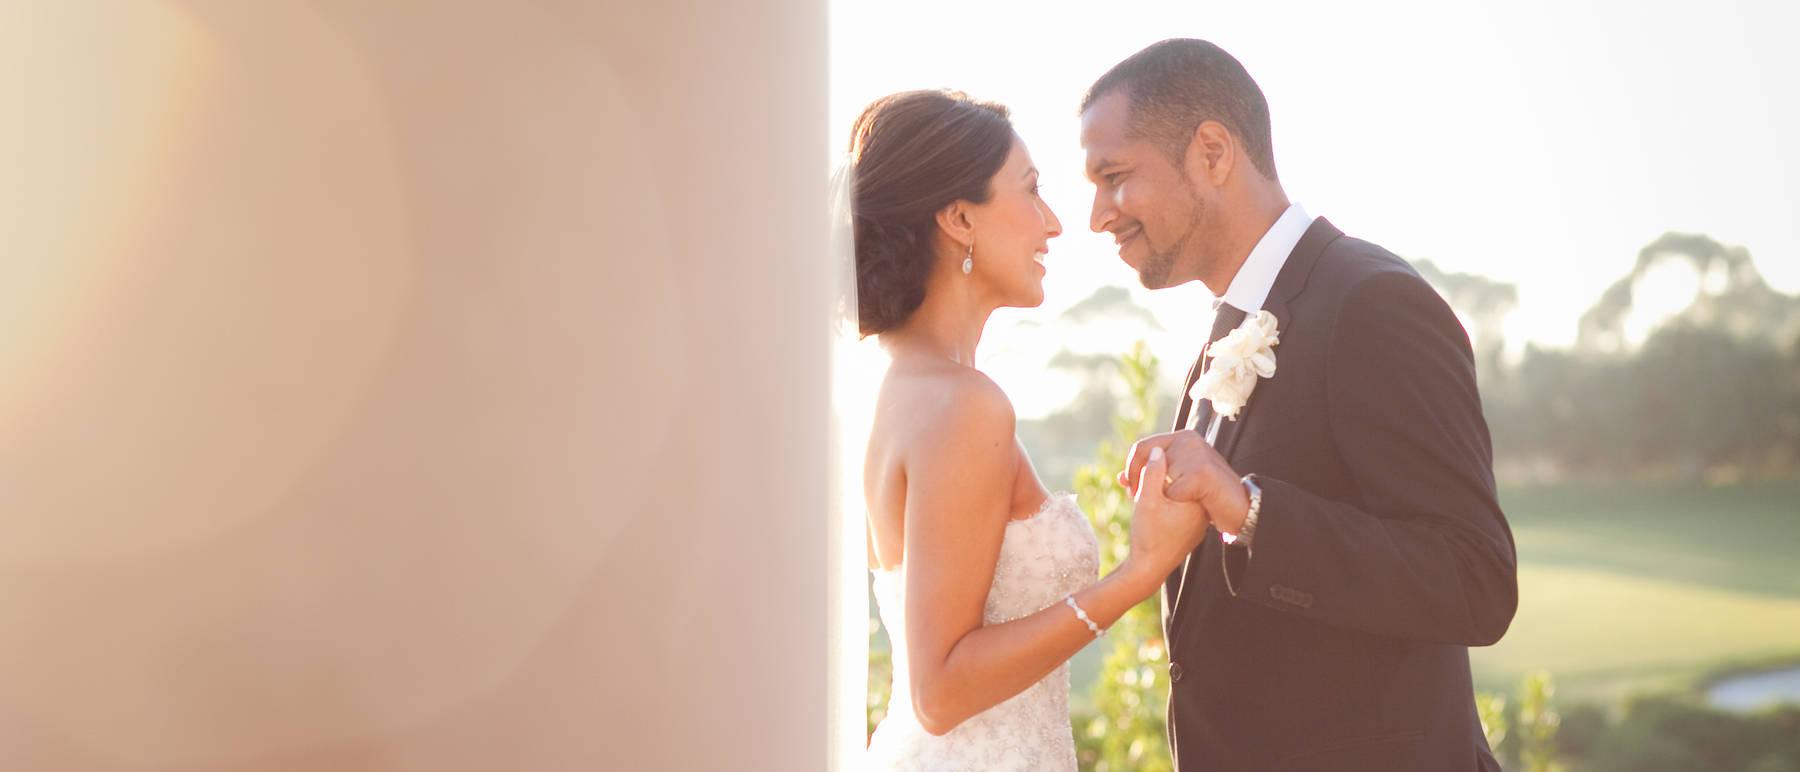 johnandjoseph-wedding-photographer-hz-slider-263